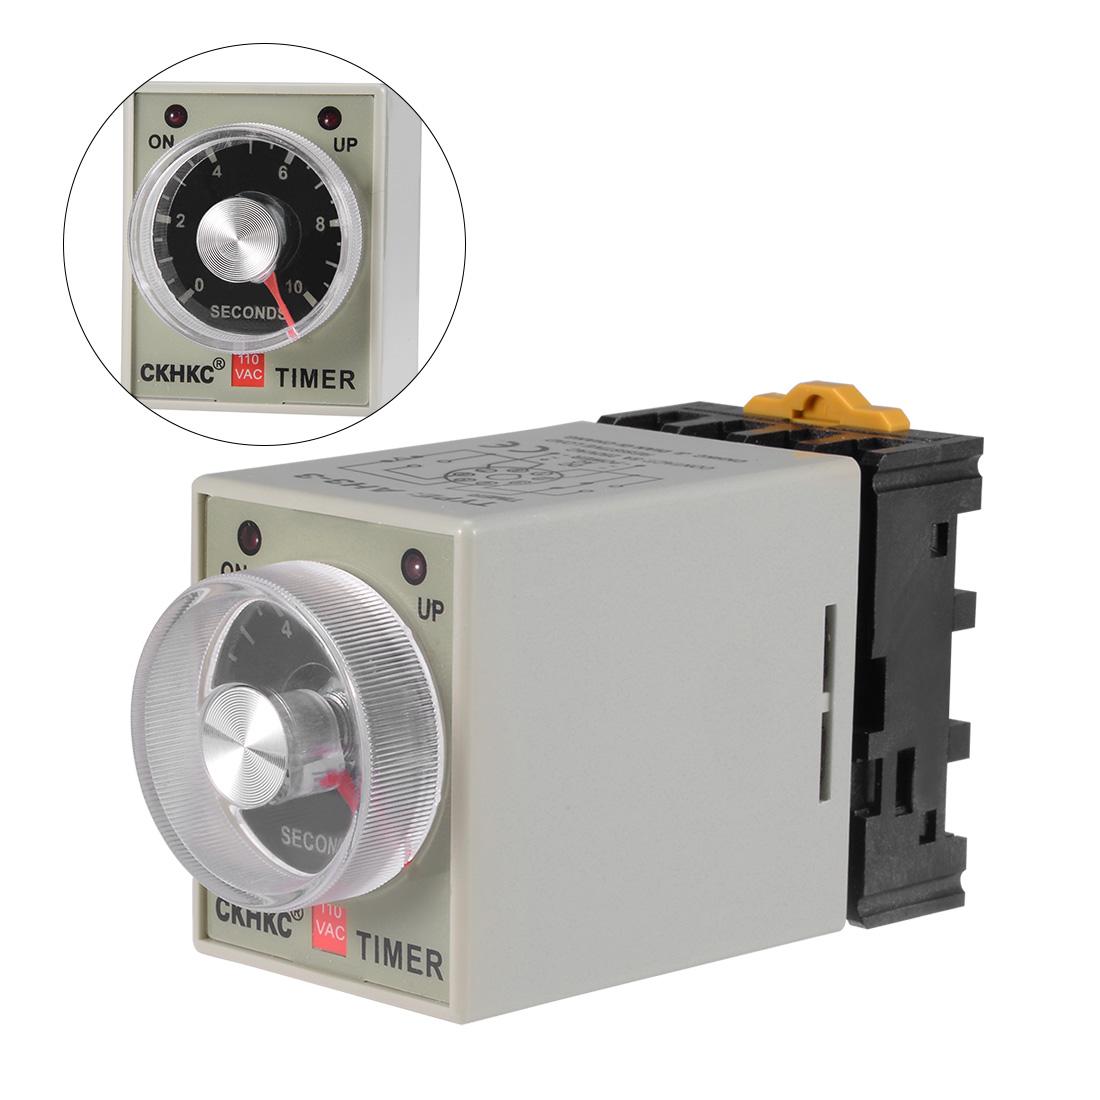 AC110V 10S 8 Terminals Range Adjustable Delay Timer Time Relay AH3-3 w base